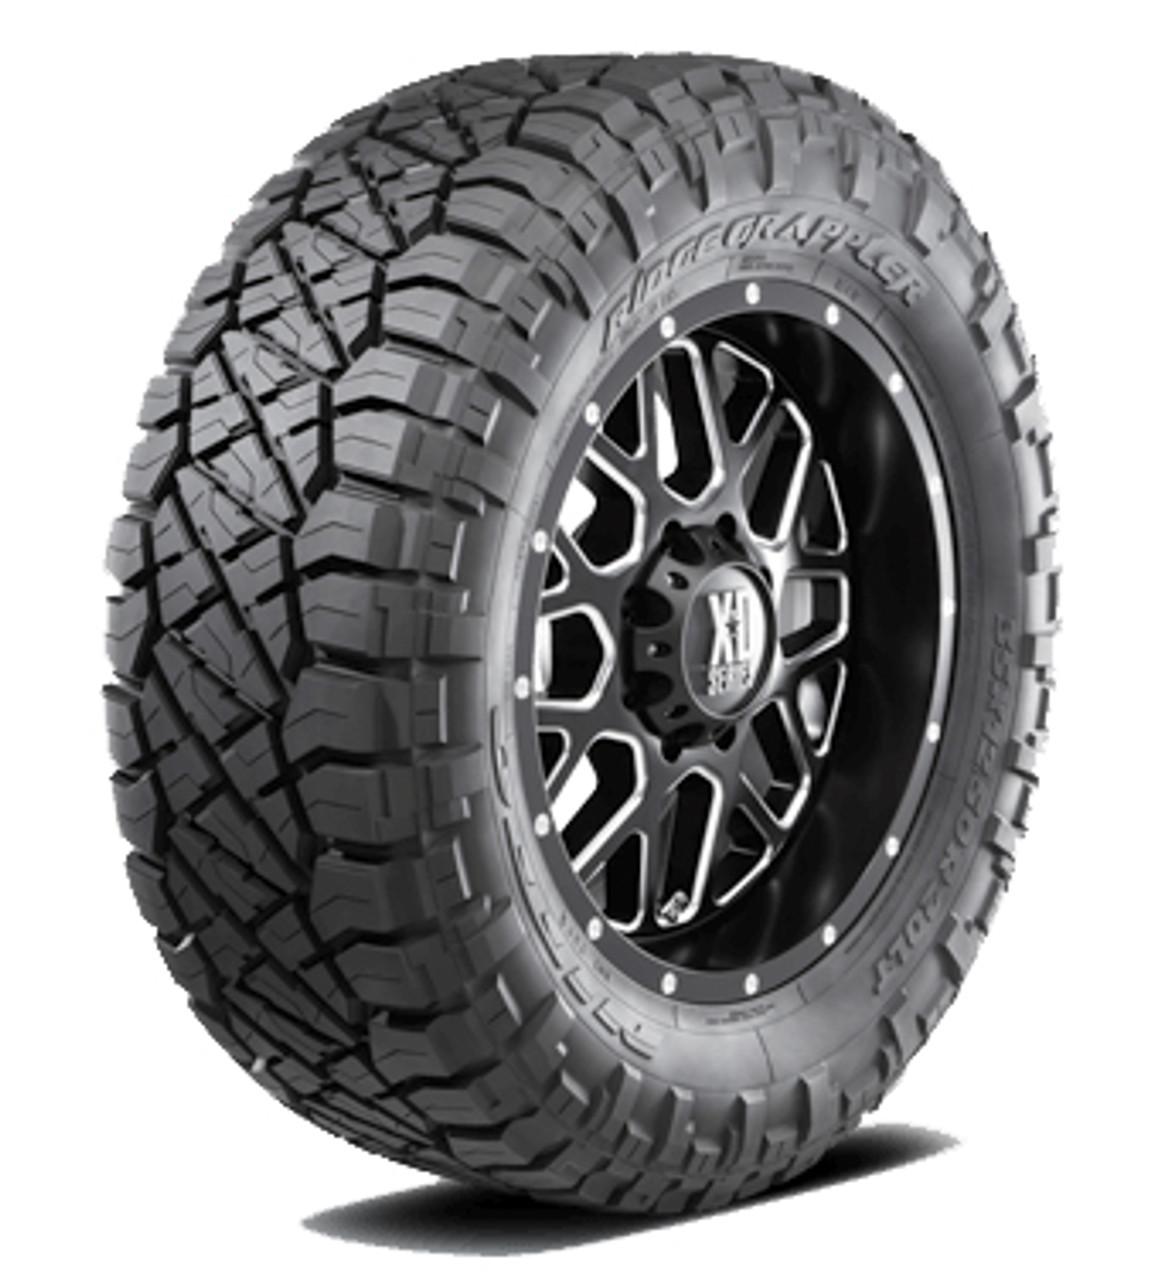 Nitto Off Road Tires >> Nitto Ridge Grappler Tire For 18 Rim